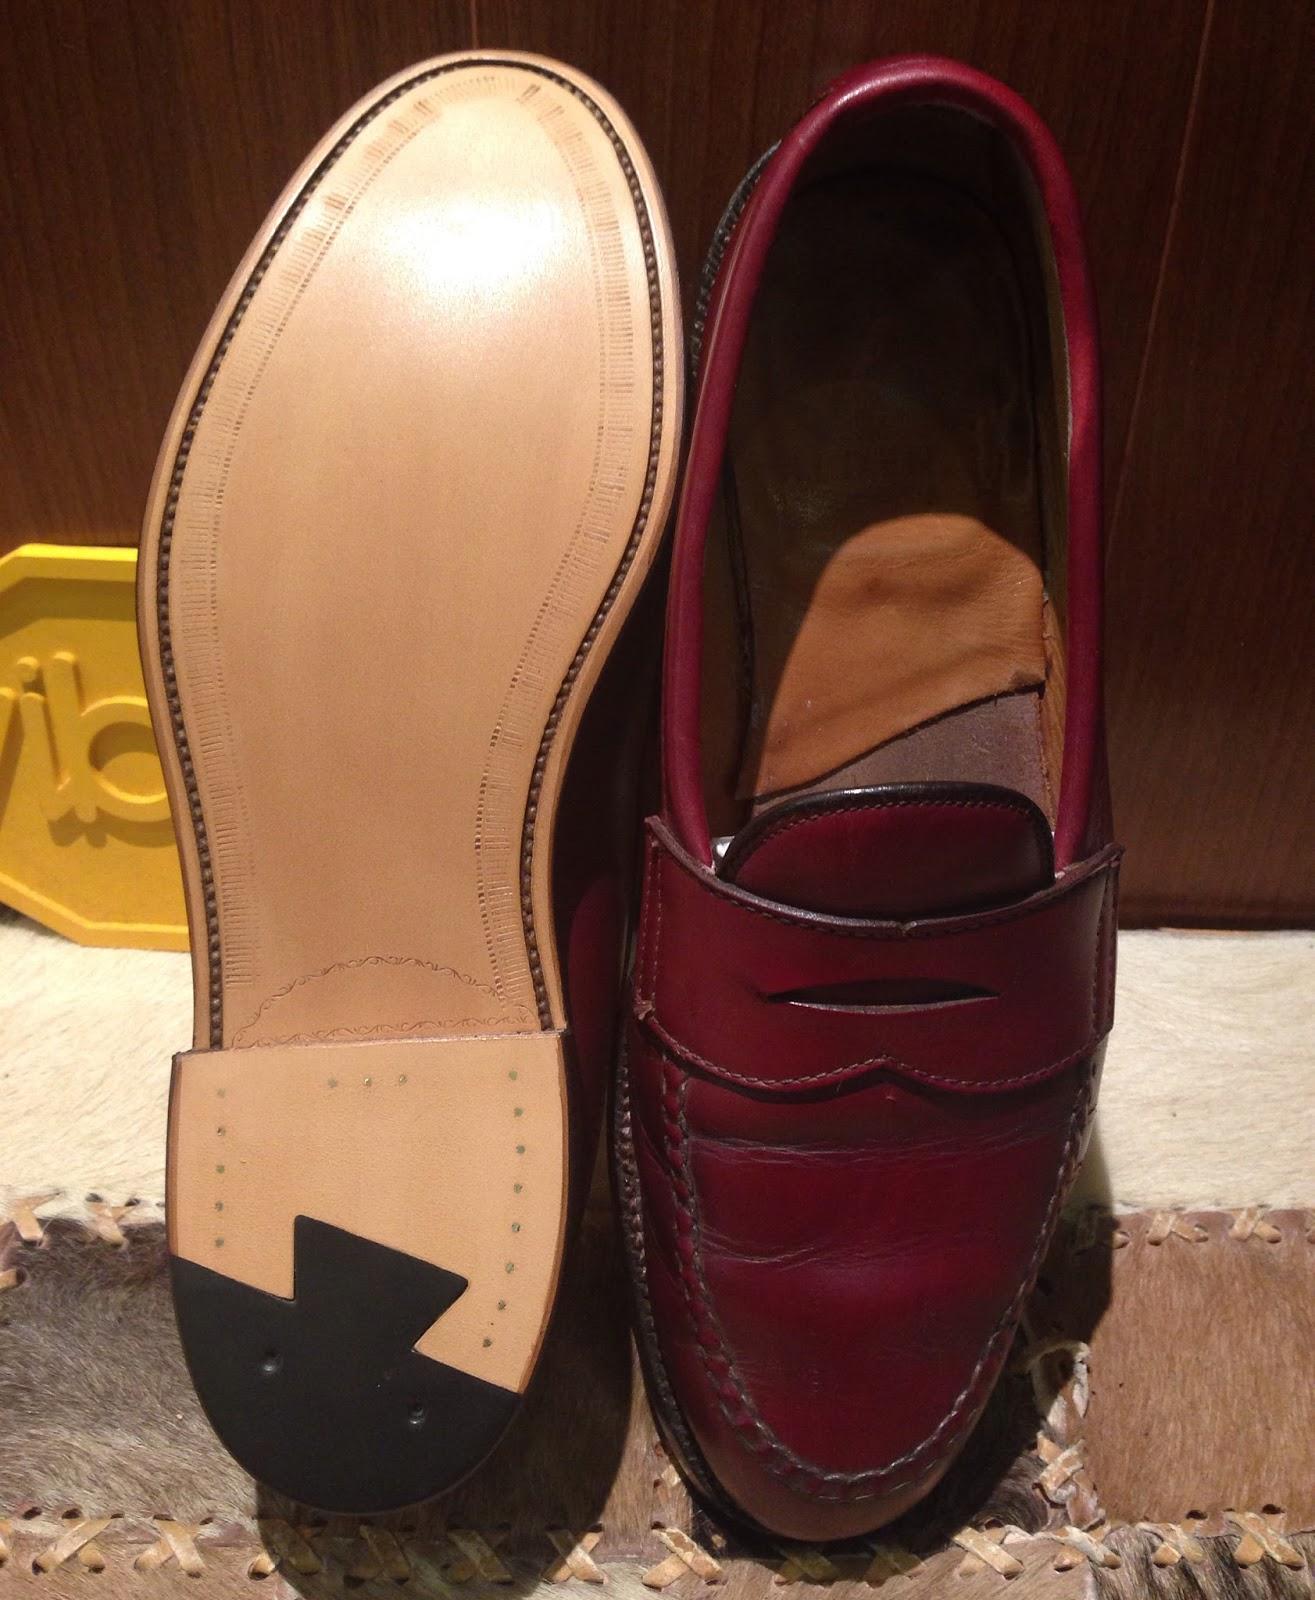 Revive Snake Shoes Amp Bag Repair Alden・red Wing・jmco ソール交換